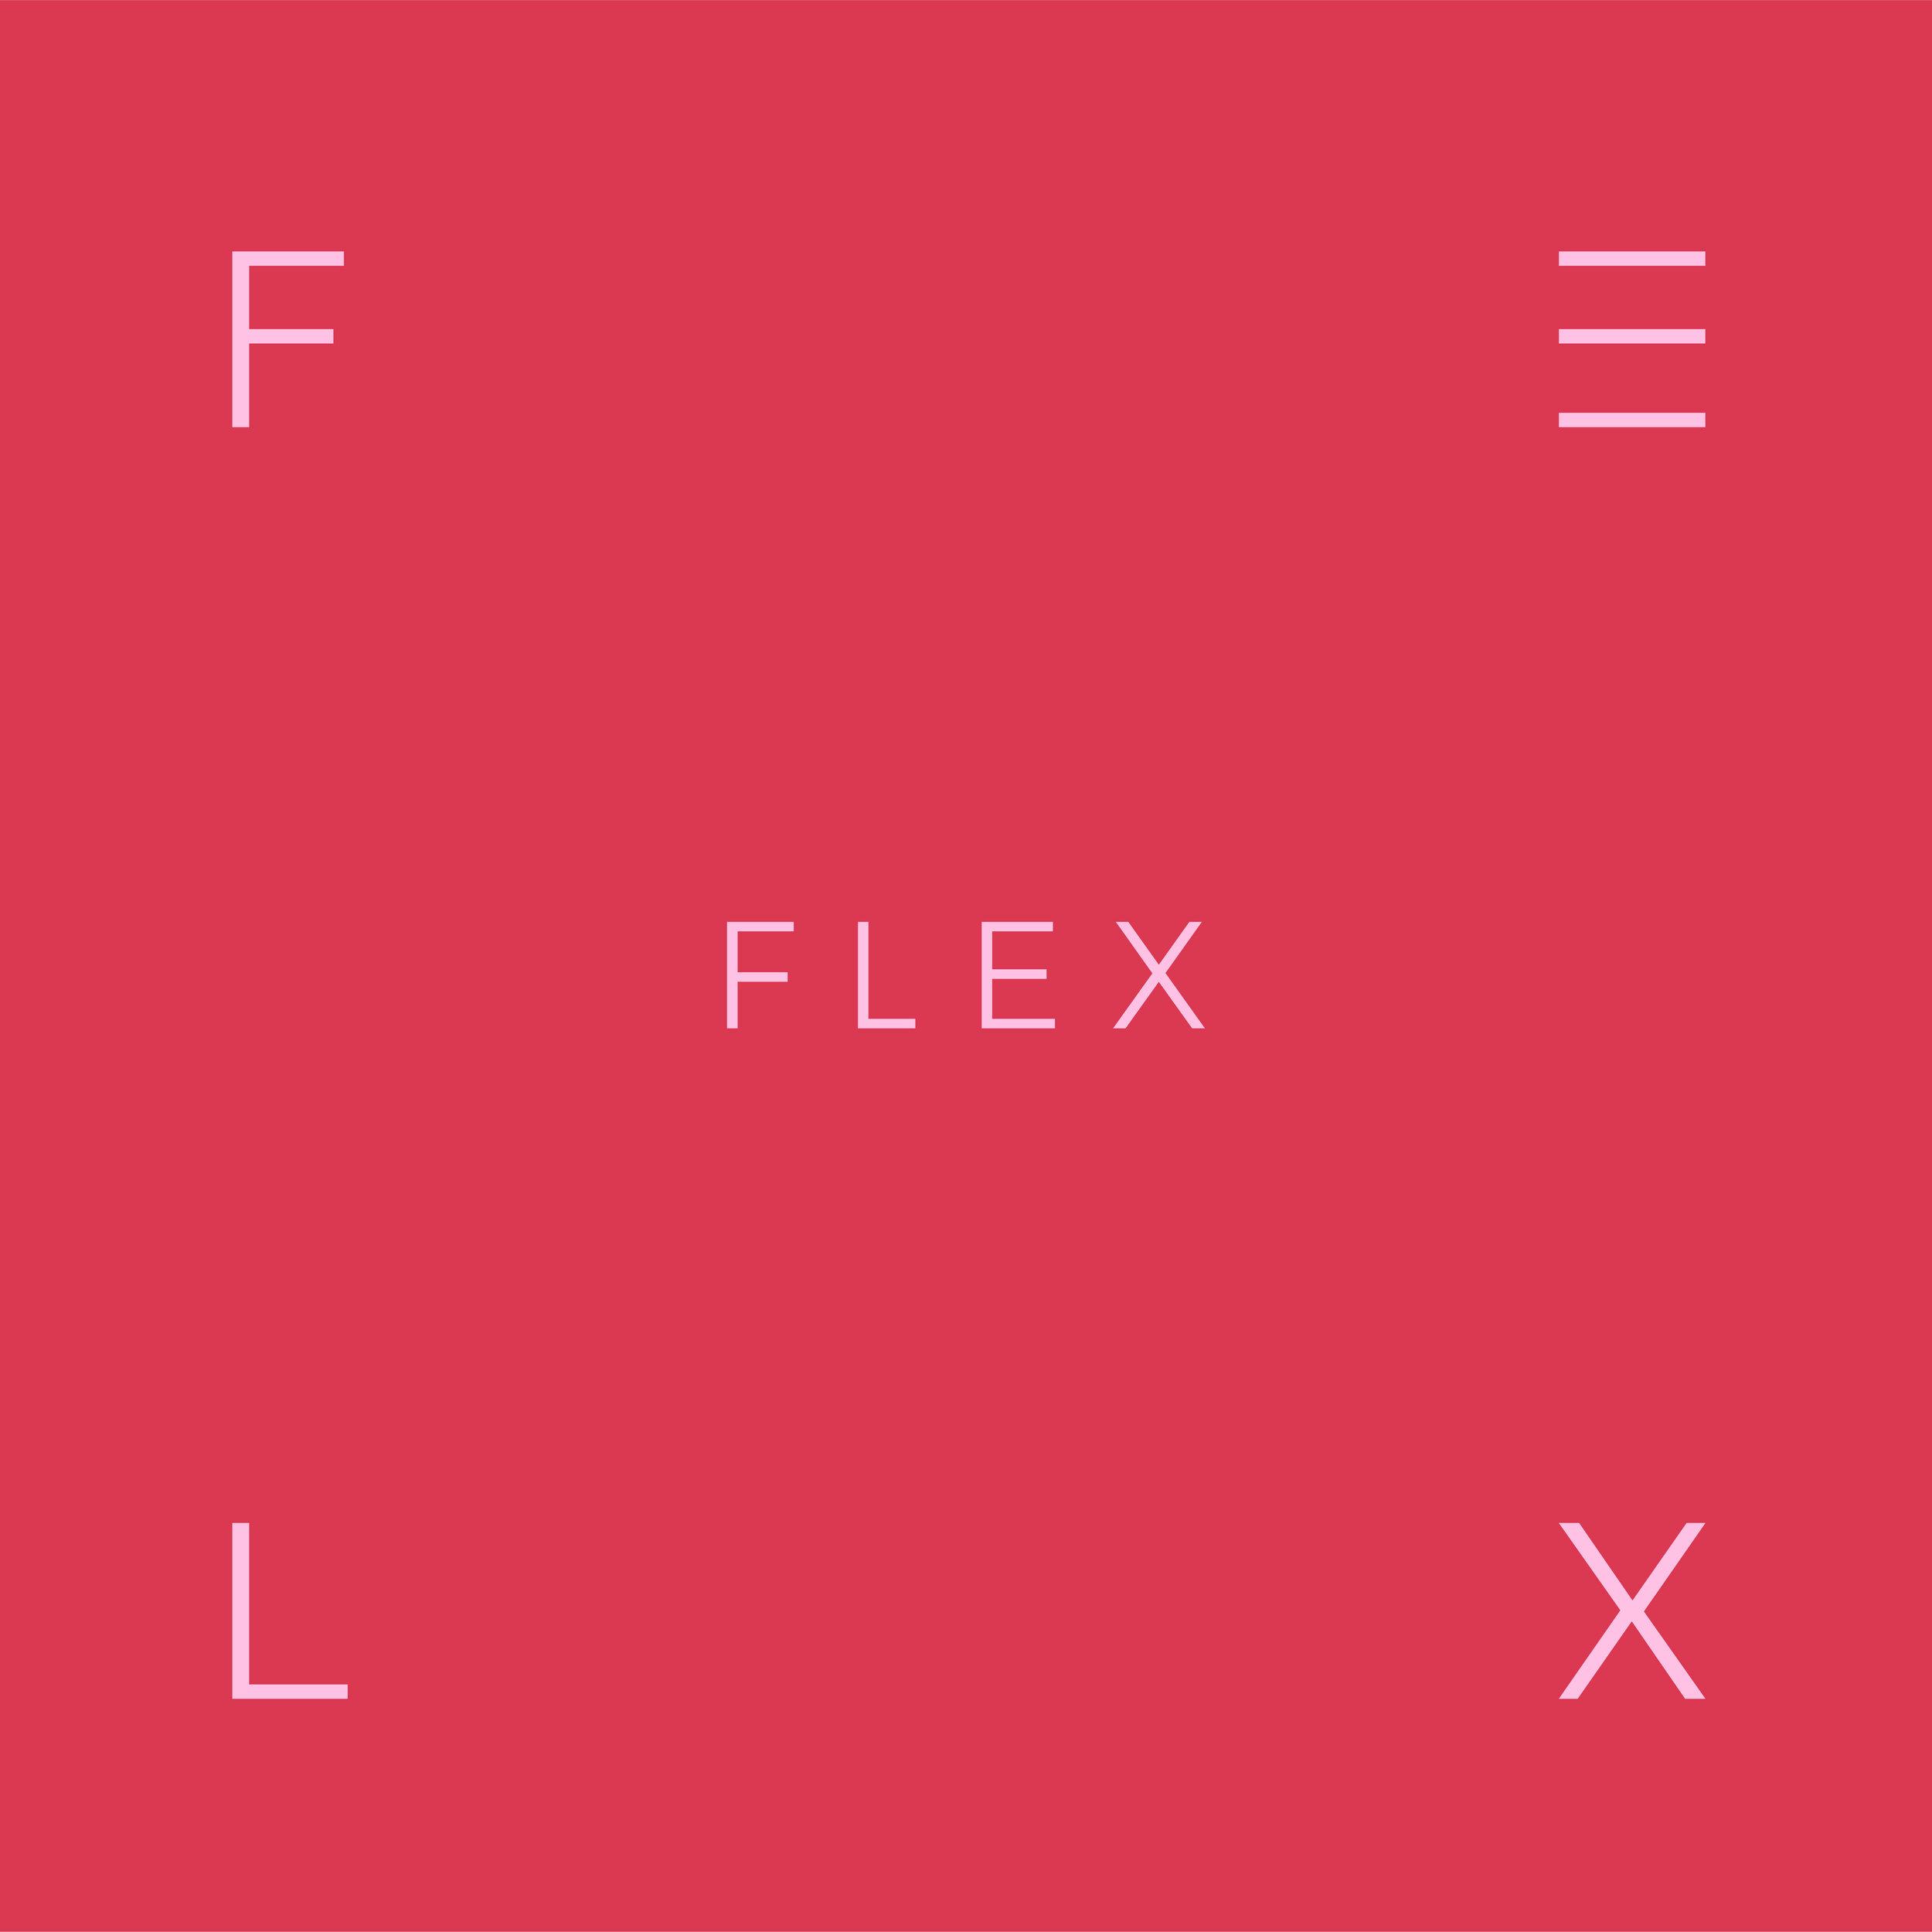 Flex_Instagram_Content-05.jpg